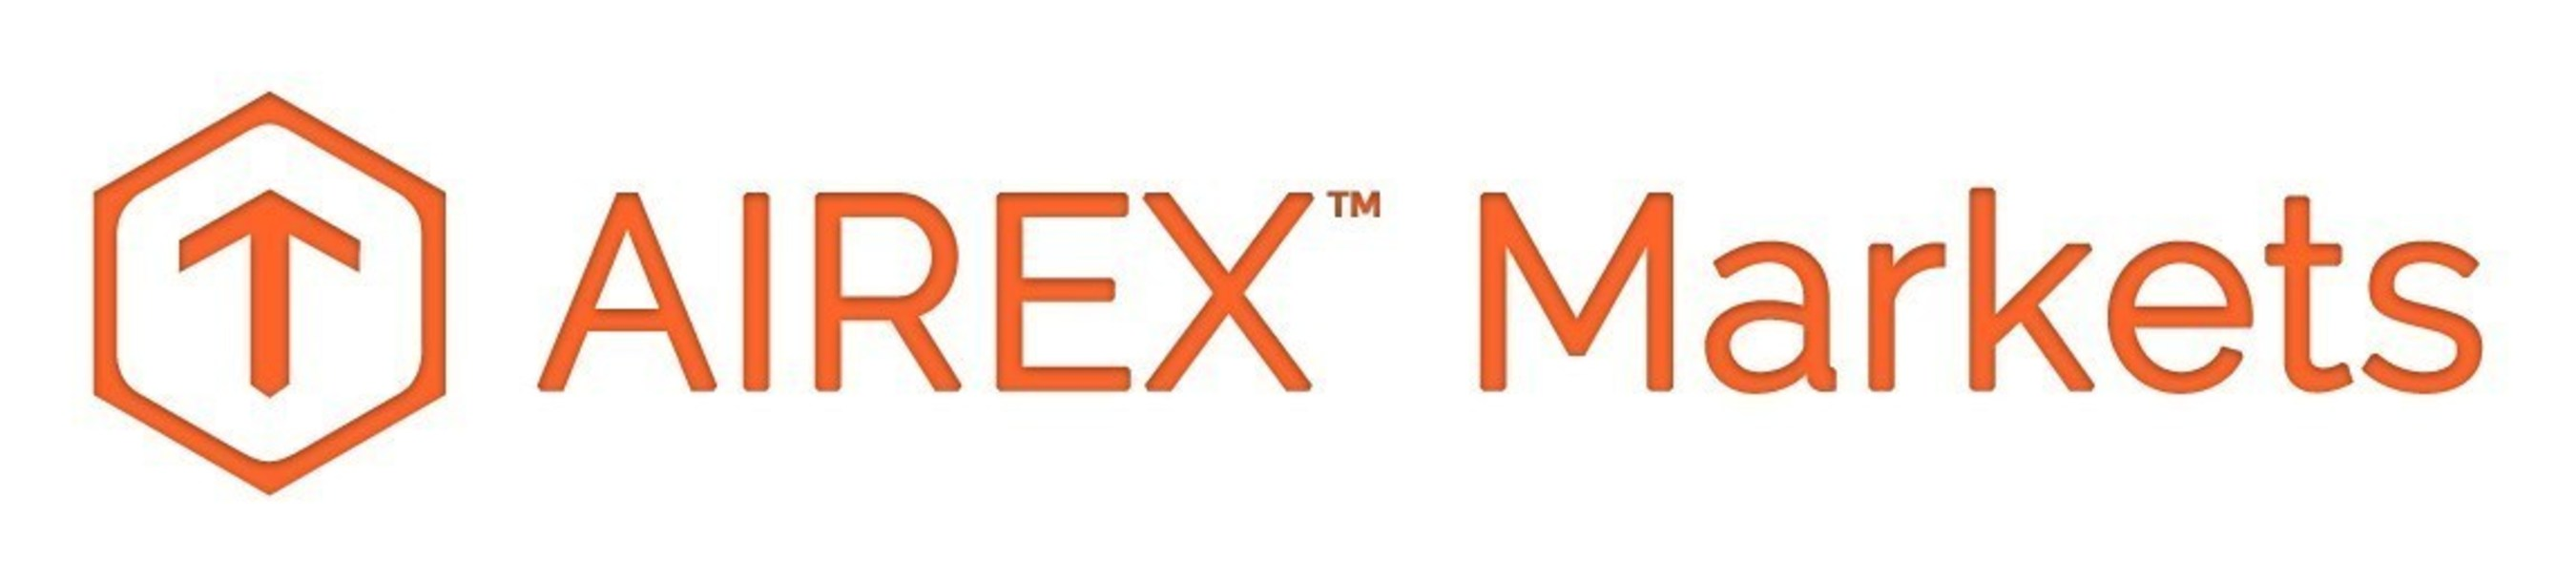 AIREX Markets Adds Three Premium Financial Information Providers